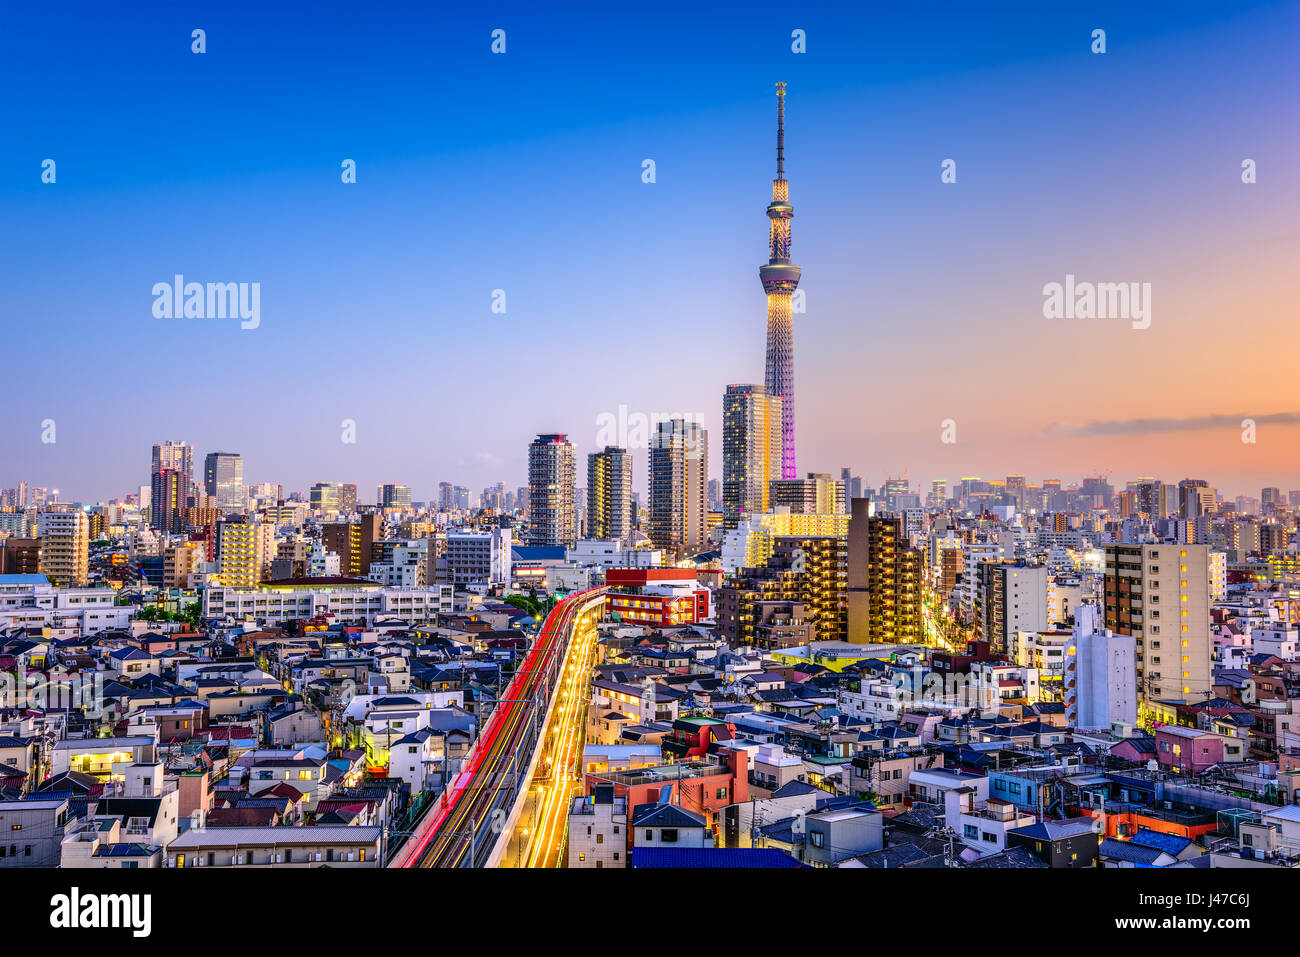 Tokyo, Japan Sumida skyline. - Stock Image